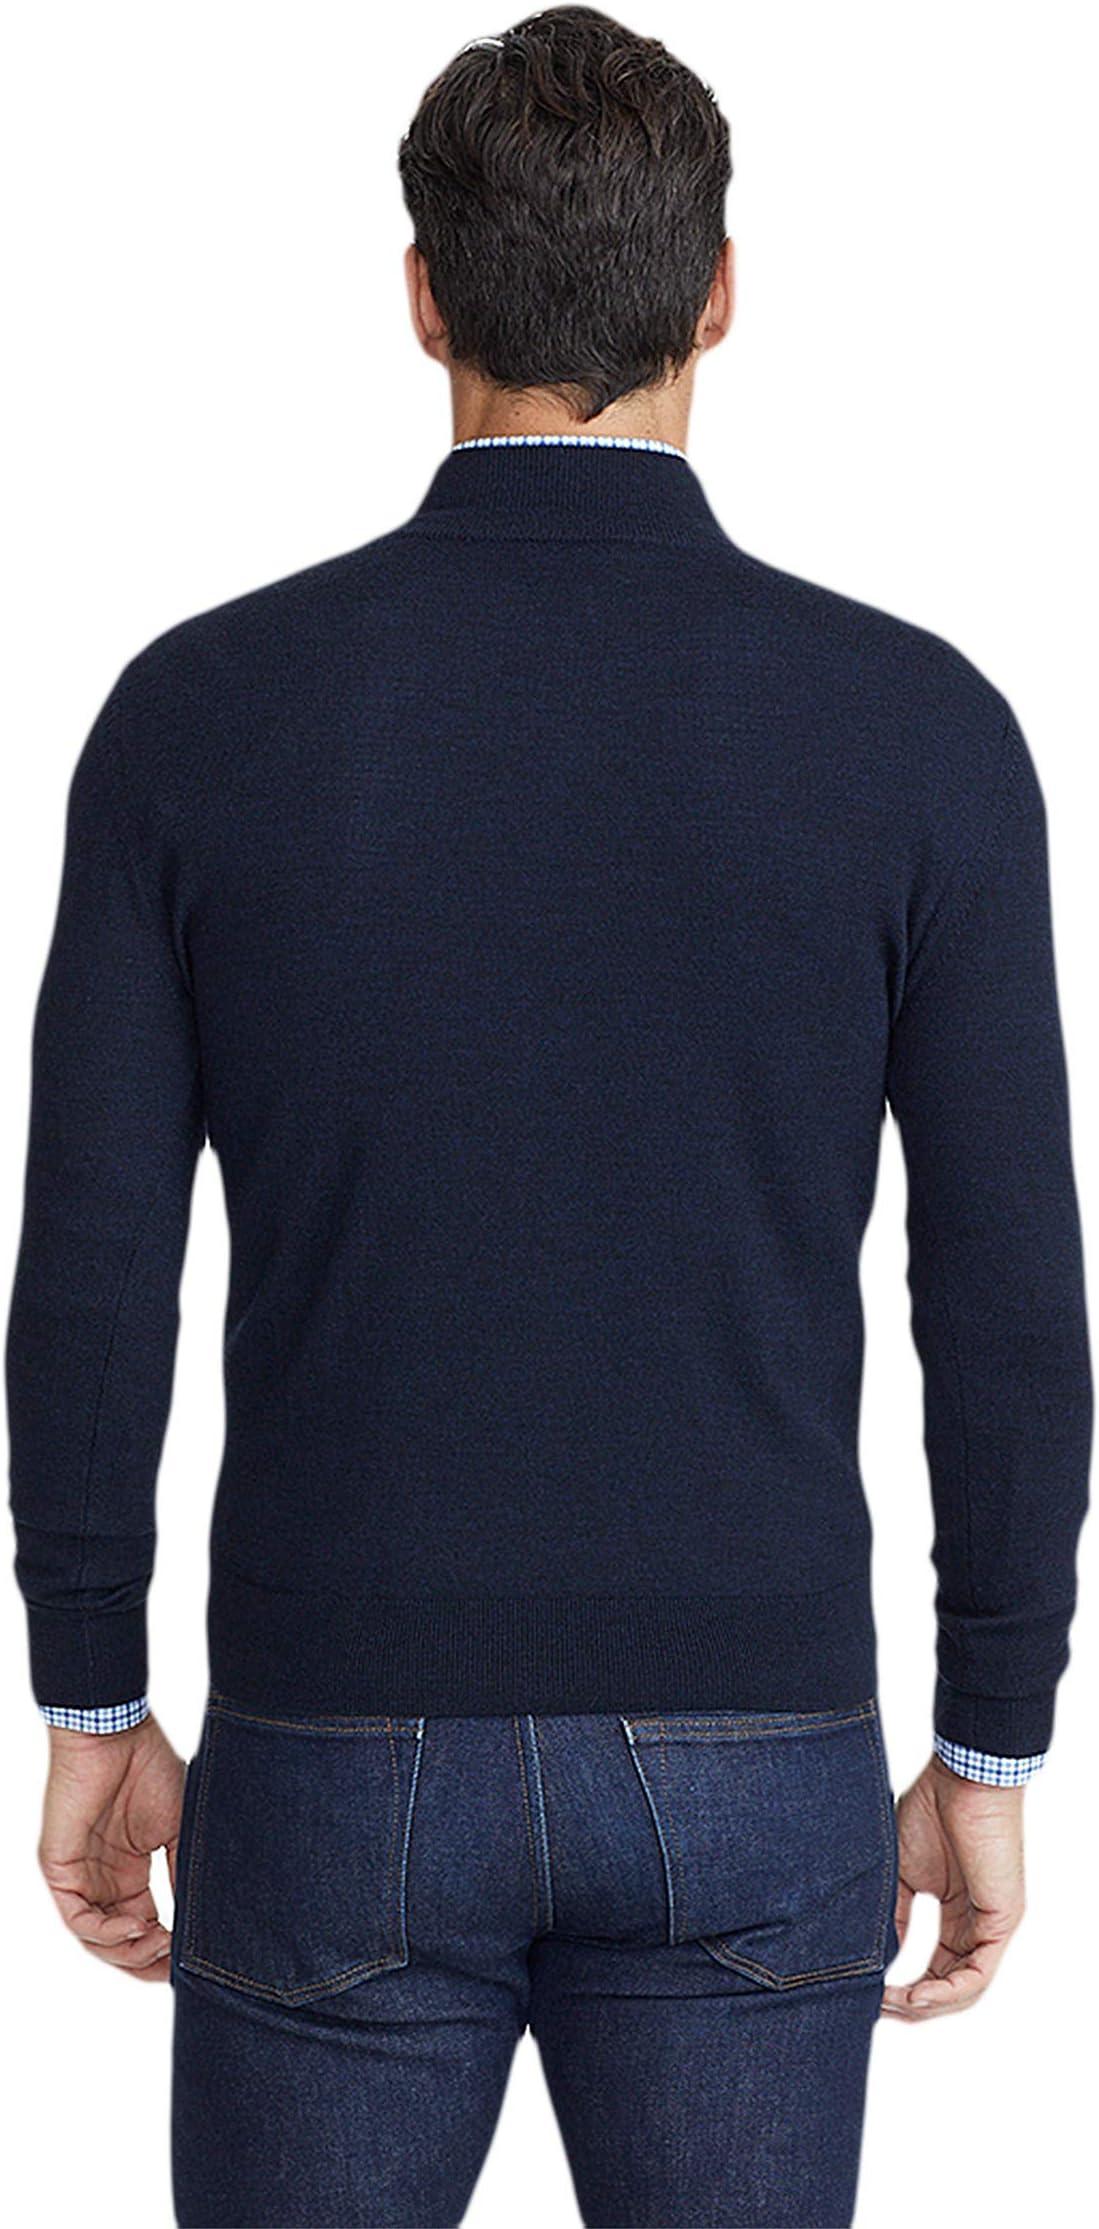 UNTUCKit Merino Wool 1/4 Zip cqwEE